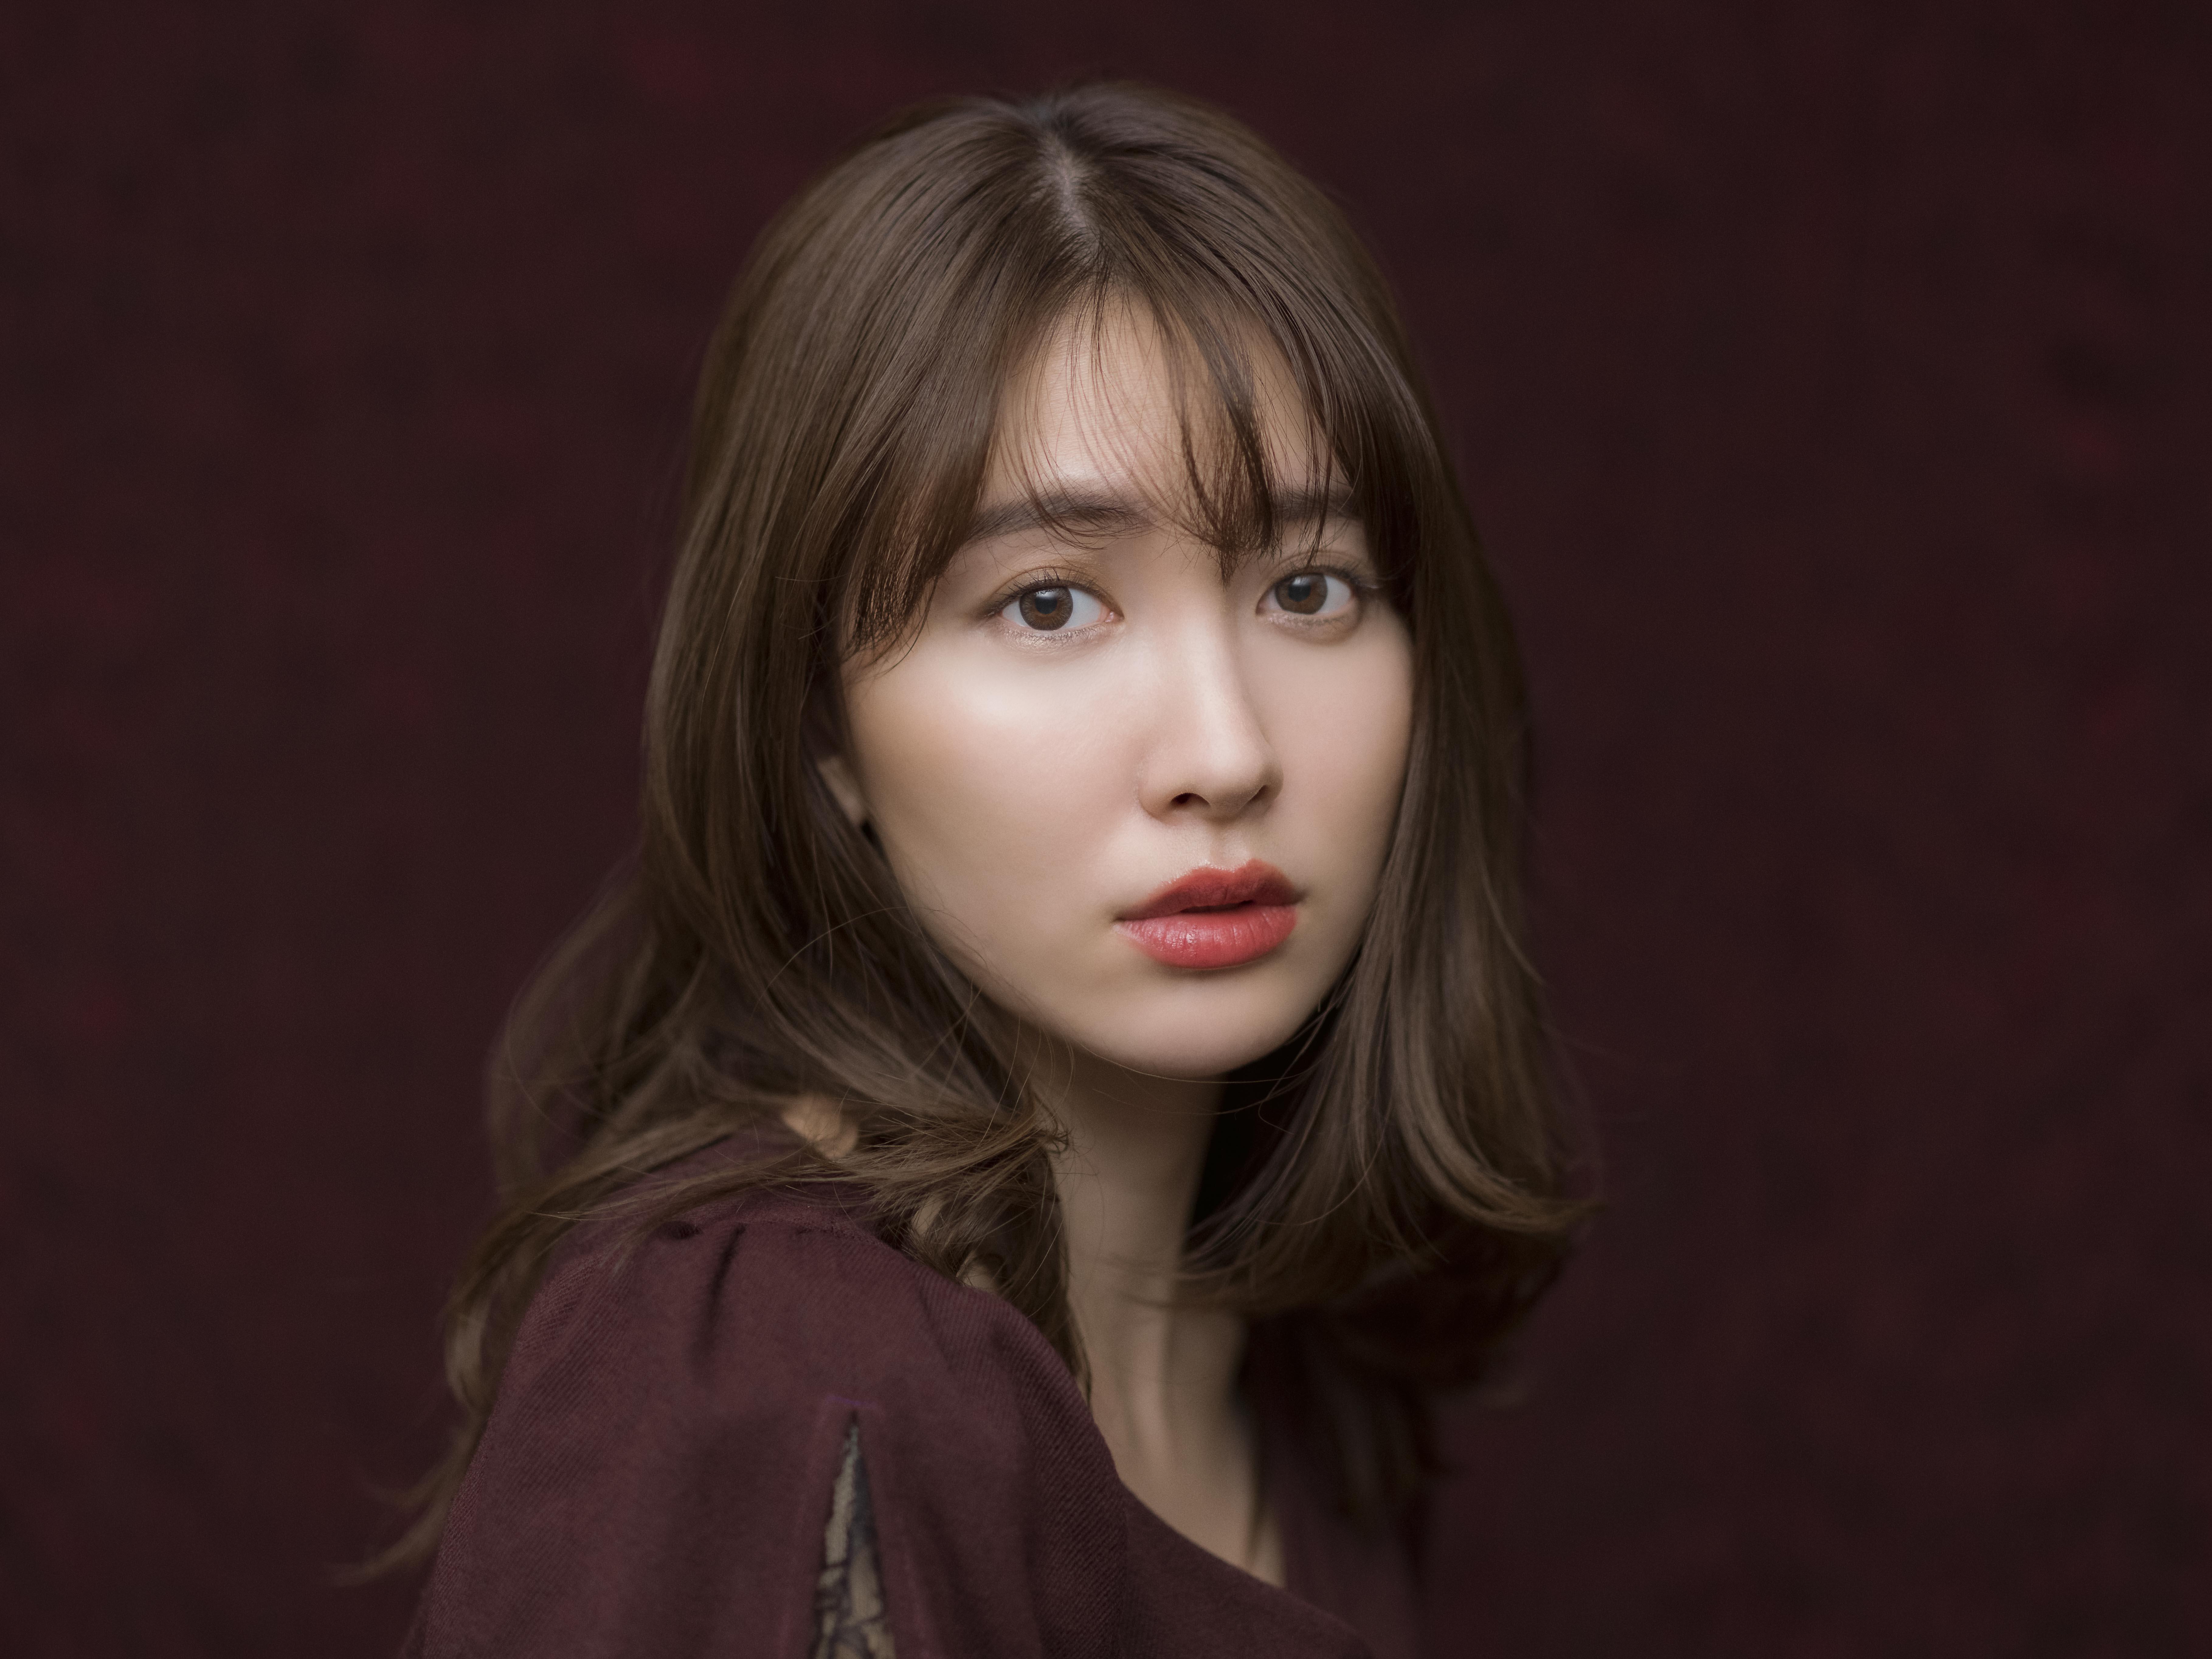 小嶋陽菜(Forbes Japan)